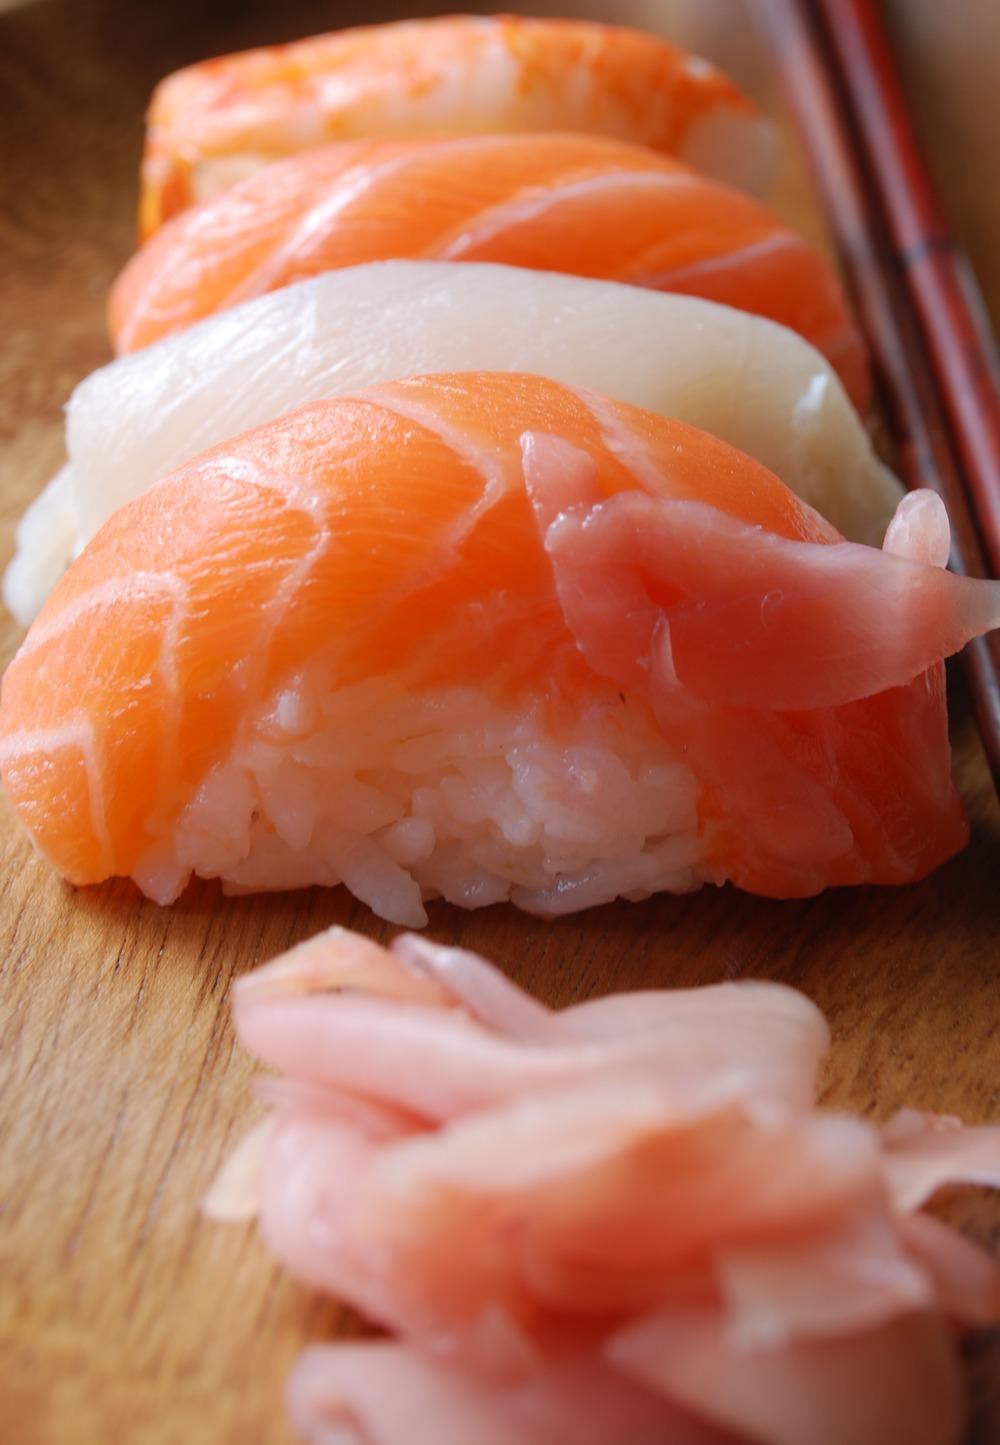 sushi-japonese-food-on-a-wooden-plate_7yfwGV.jpg